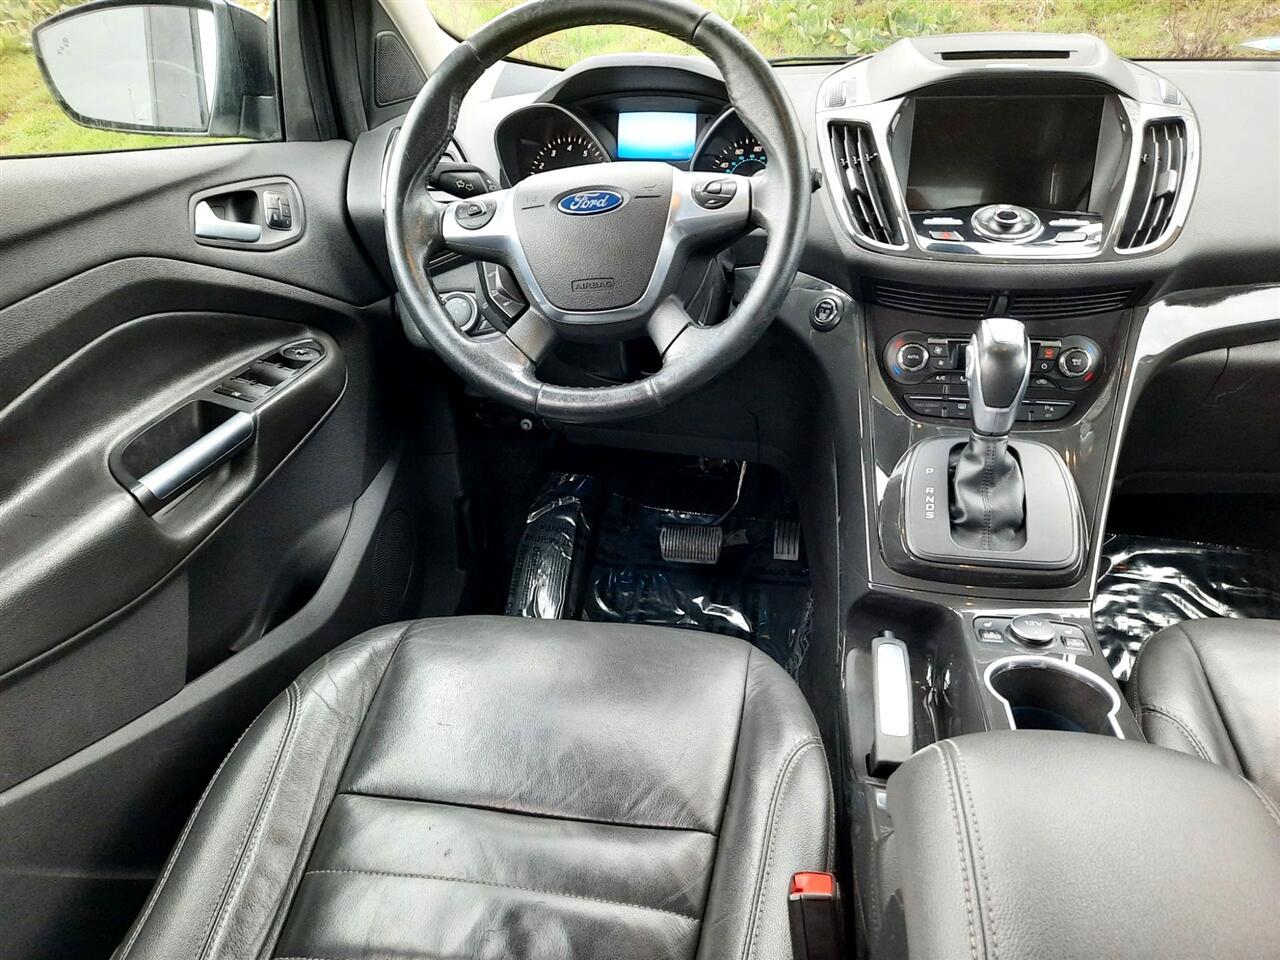 Ford Escape FWD 4dr Titanium 2016